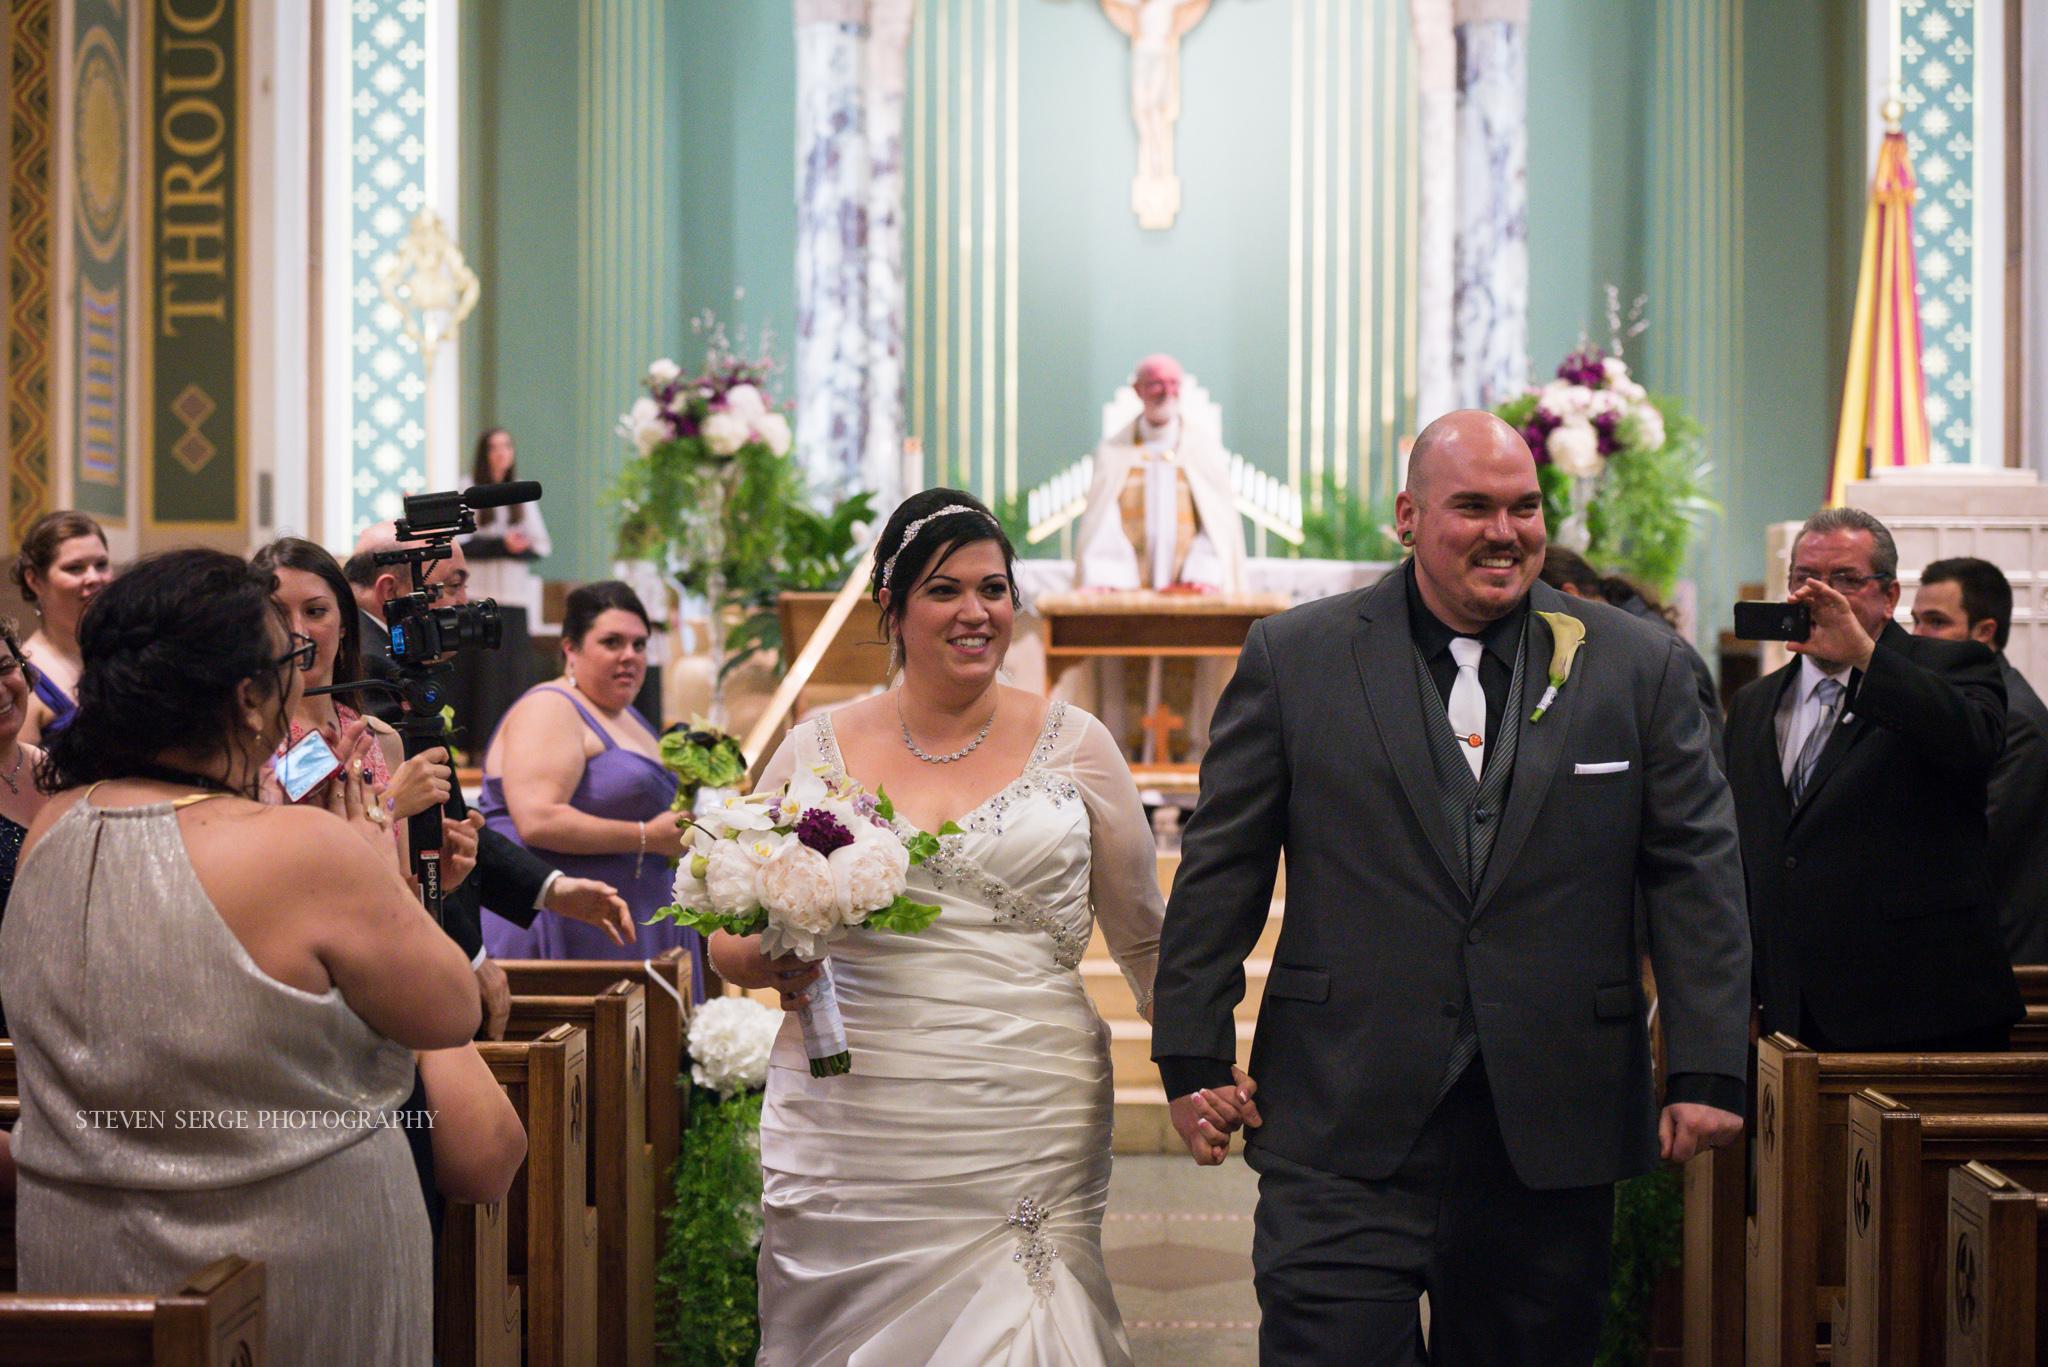 Scranton-wedding-photographer-fiorellis-steven-serge-19.jpg